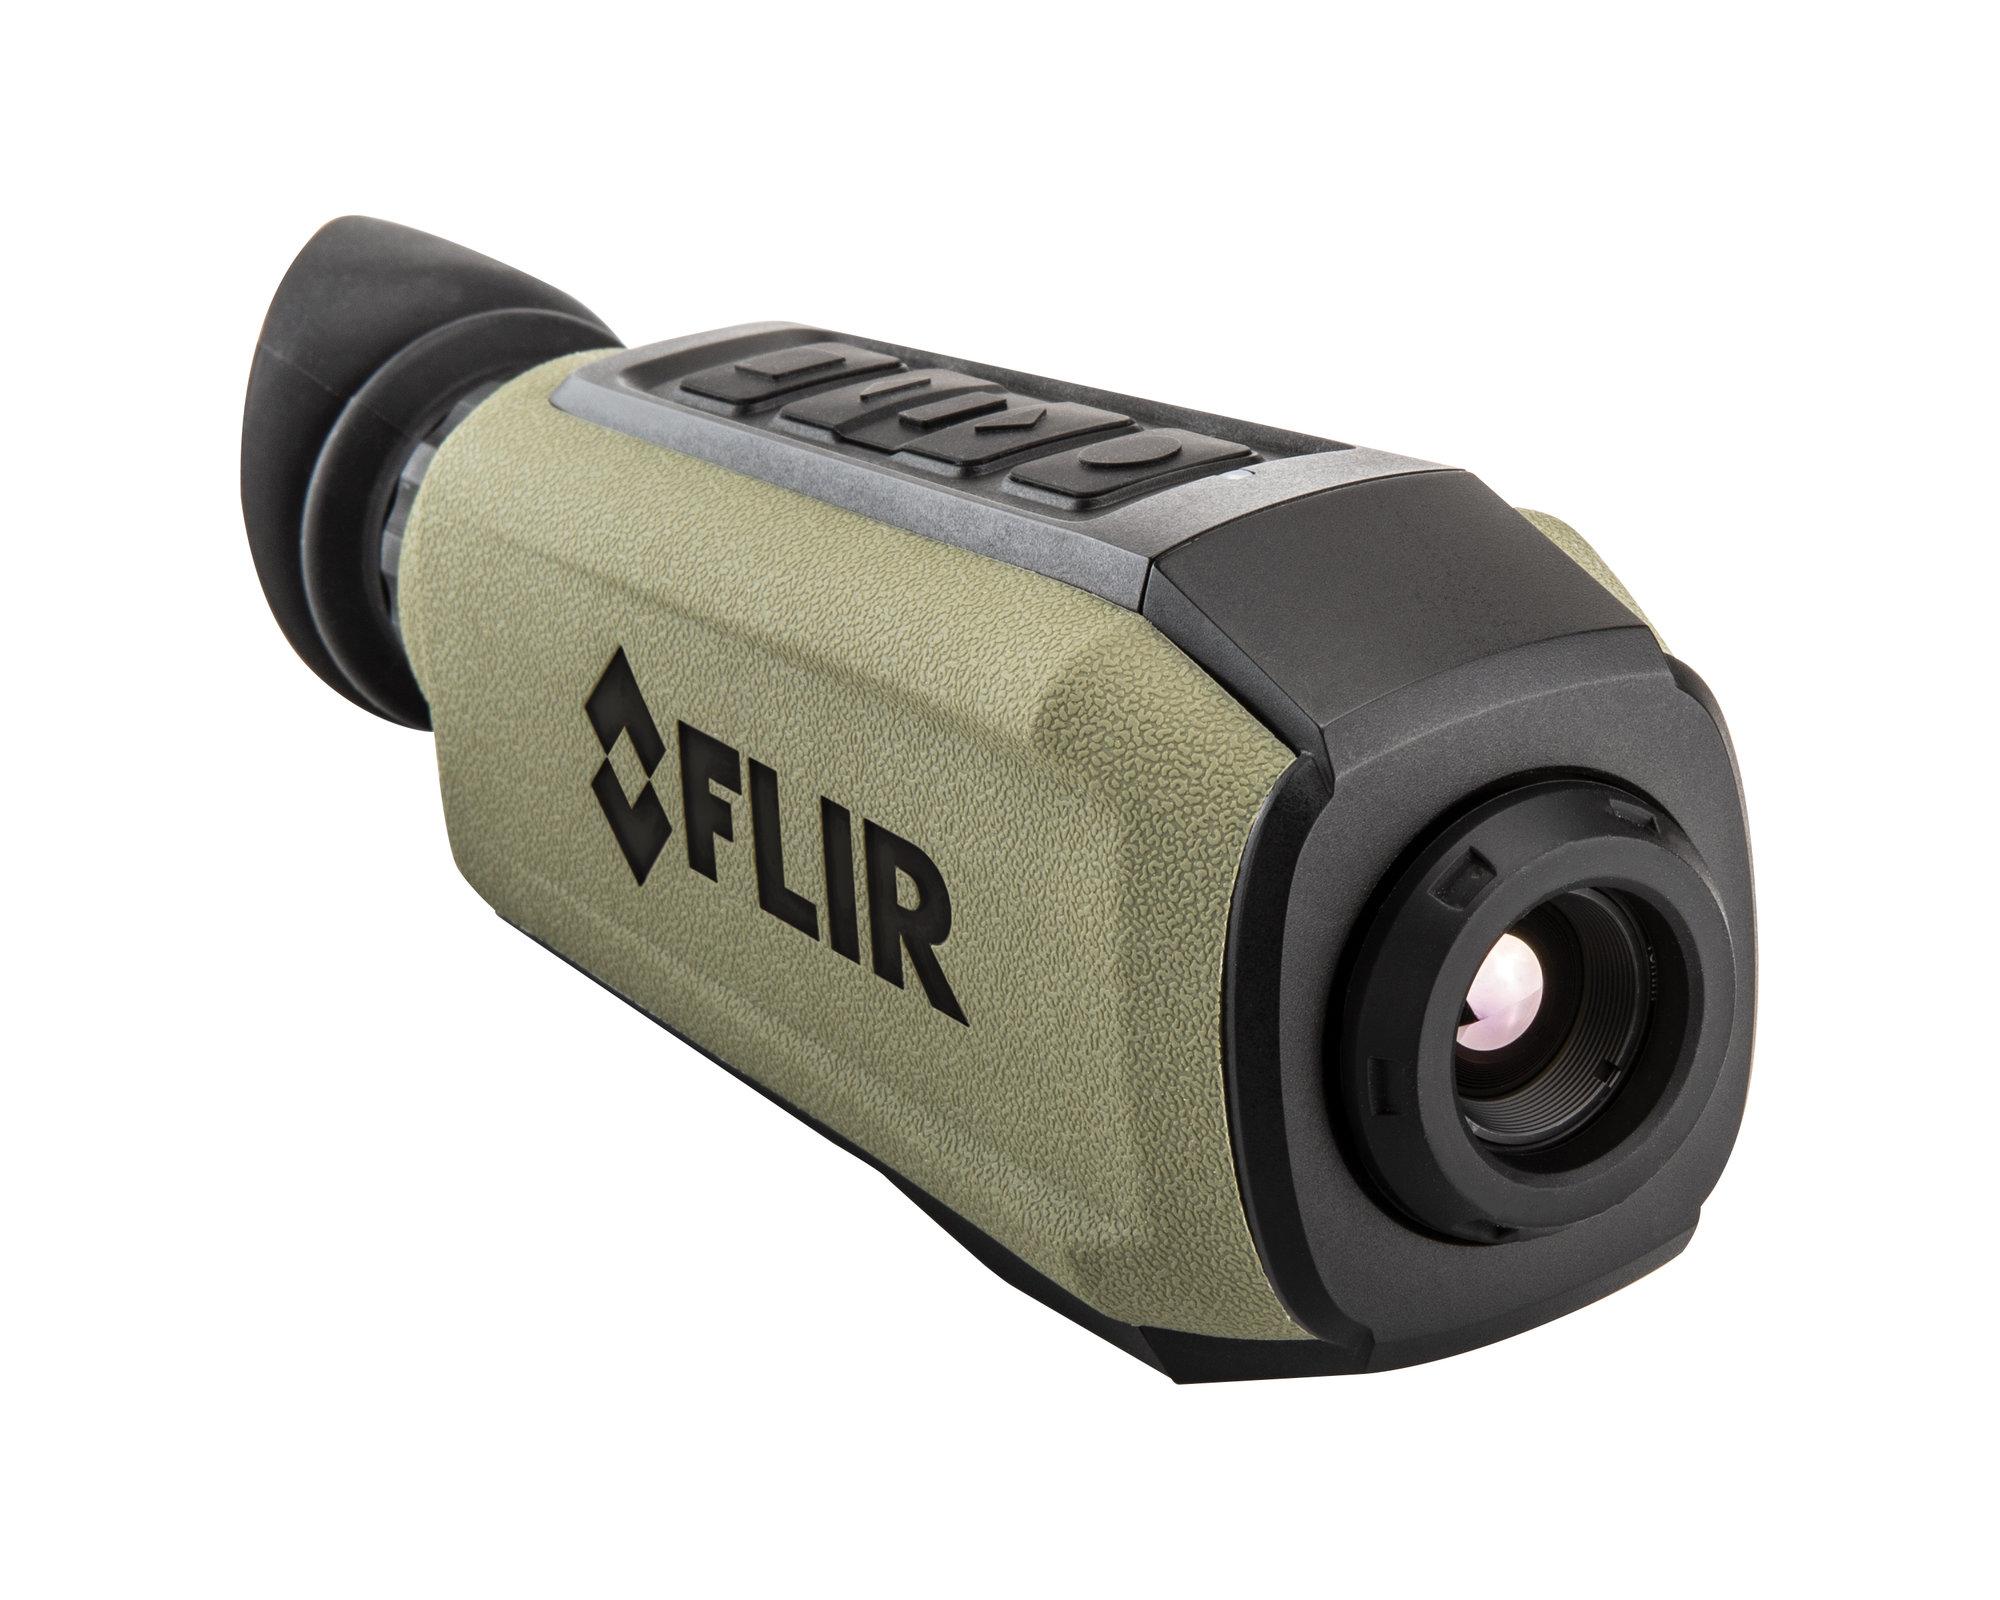 Termovízia FLIR SCION OTM 266 640x512 - 18 mm